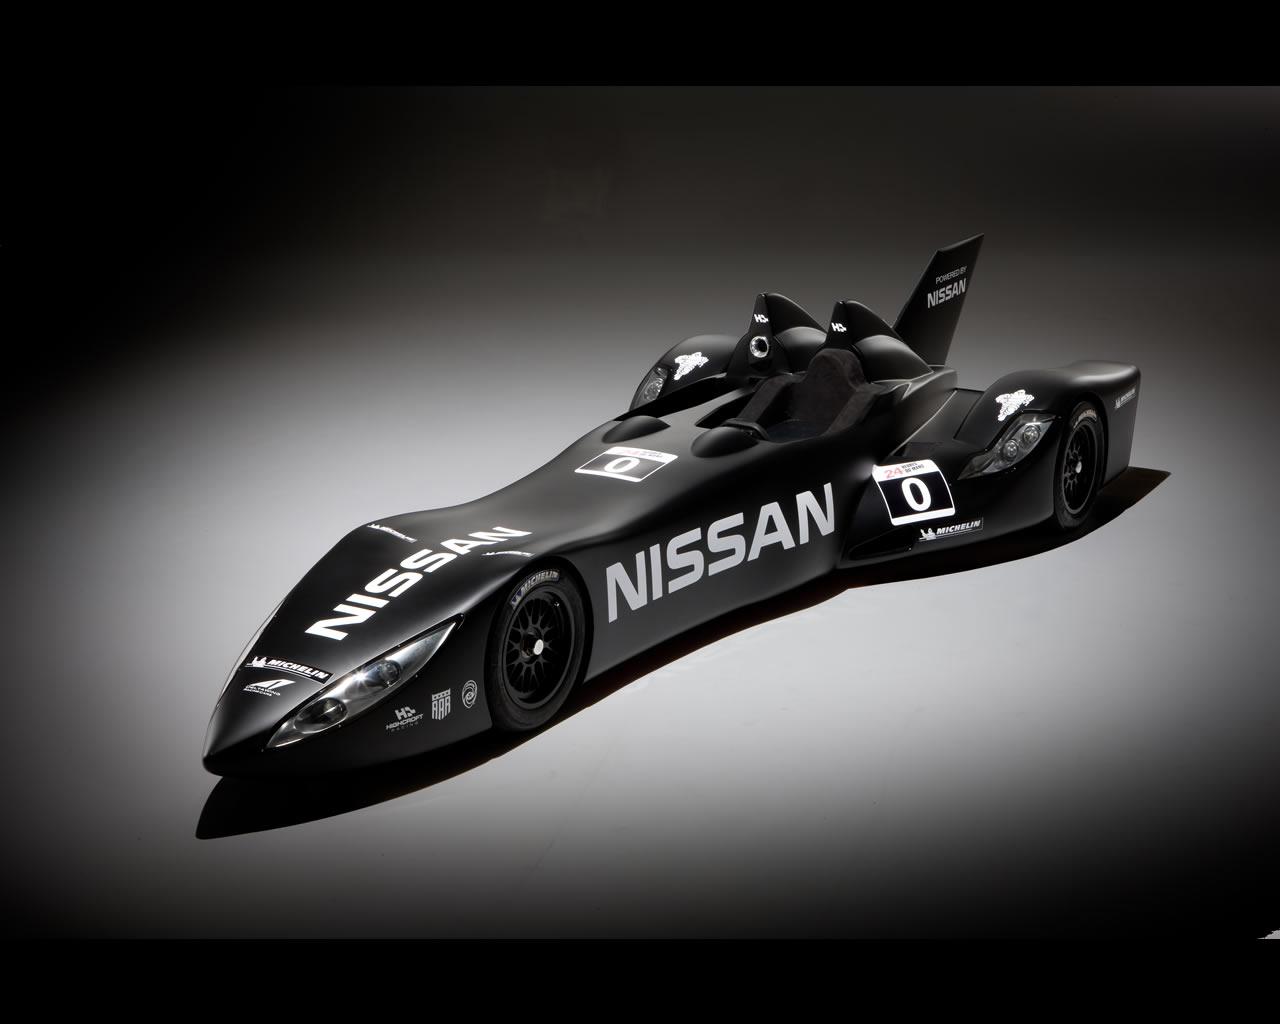 nissan deltawing racing prototype 2012. Black Bedroom Furniture Sets. Home Design Ideas